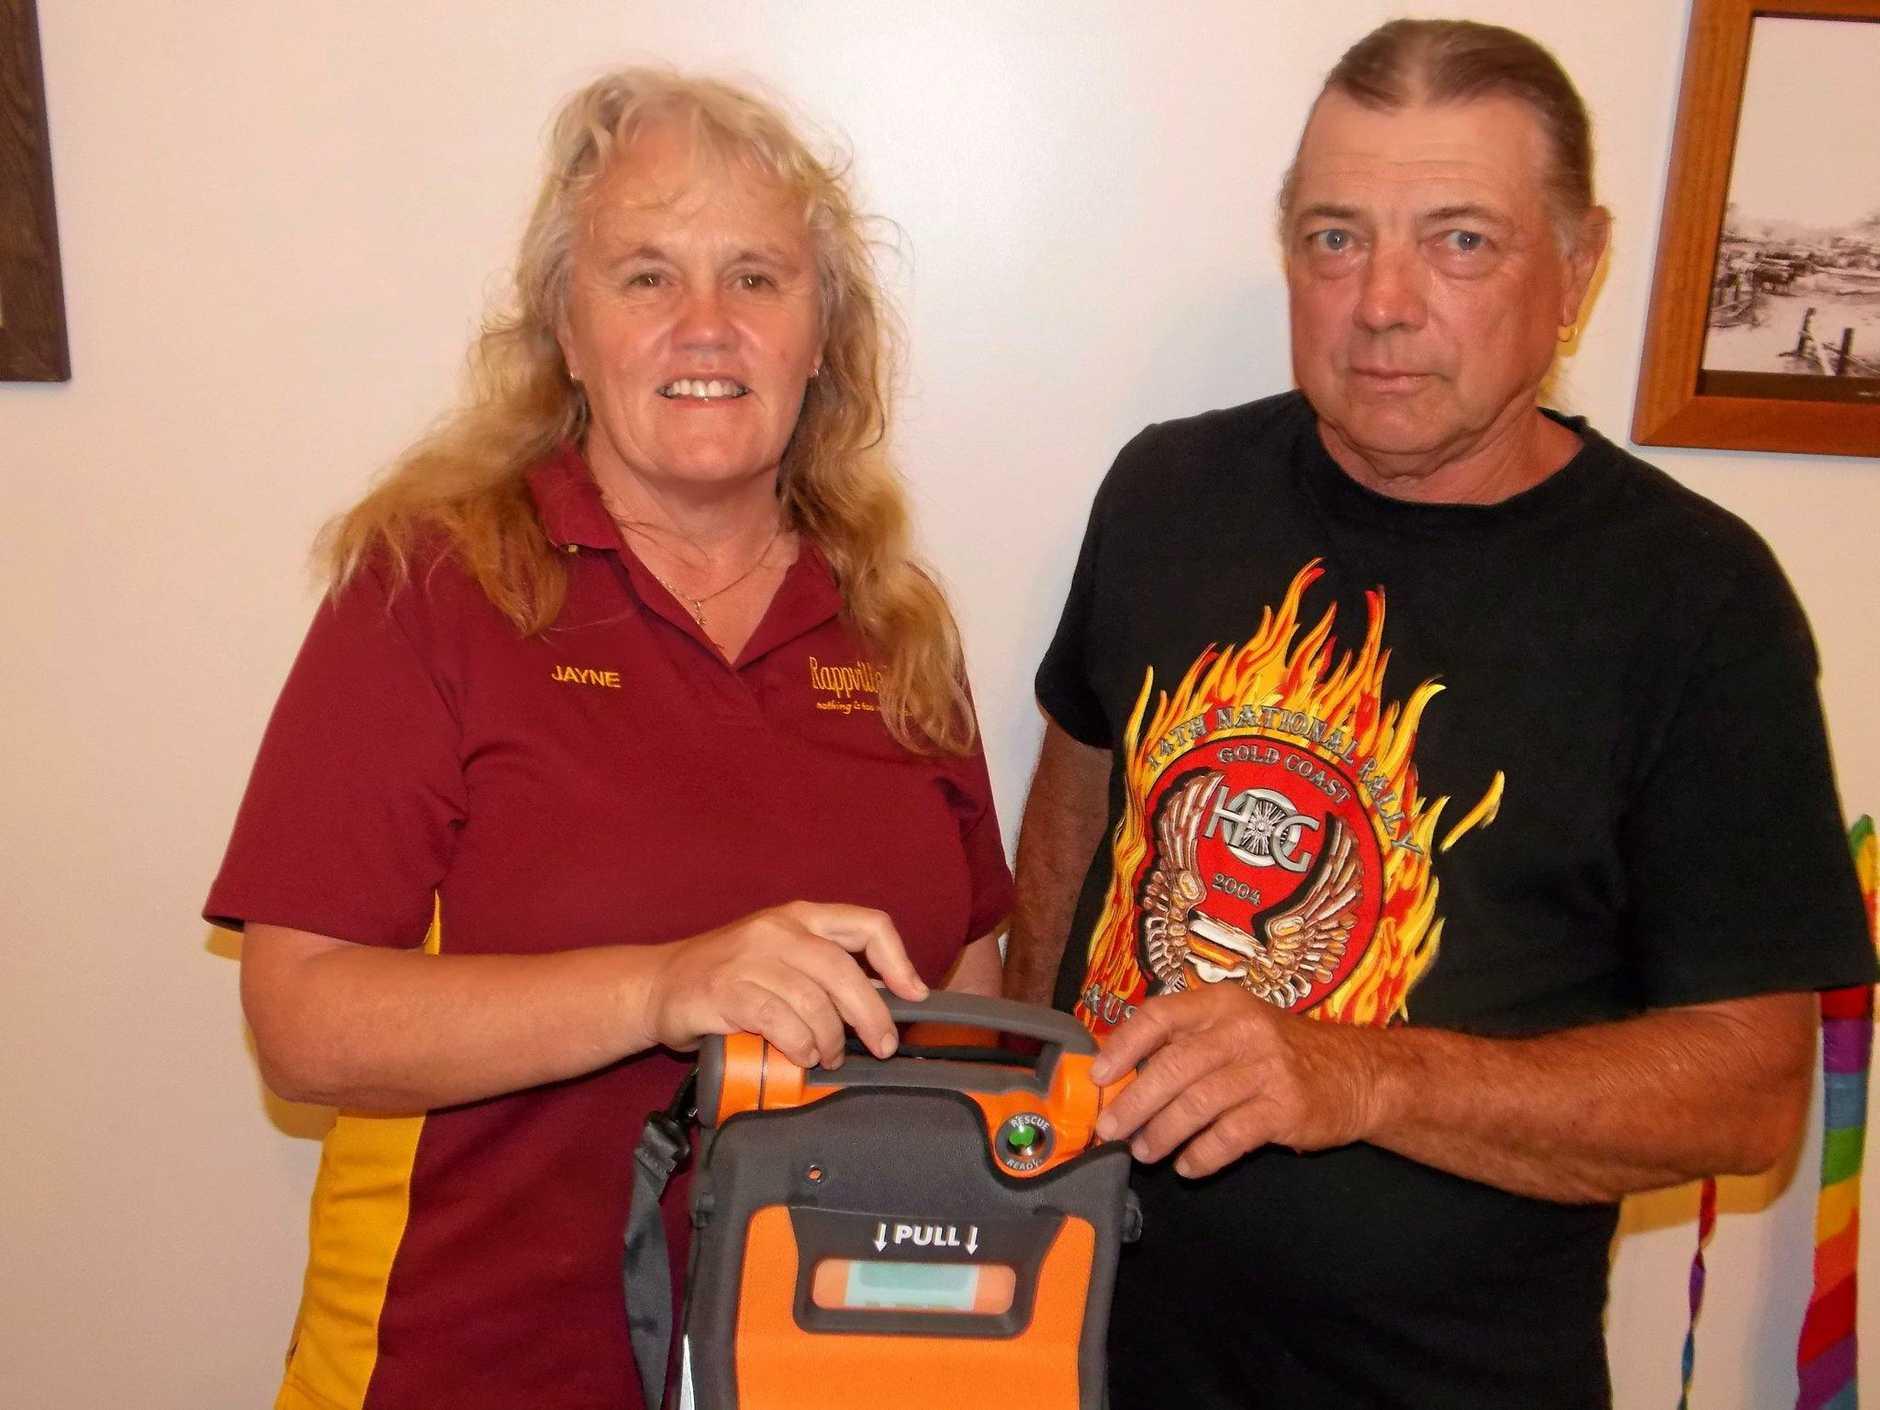 Rappville publican Jane Fitzpatrick with Social Club President Steve Bennett and defibrullator.